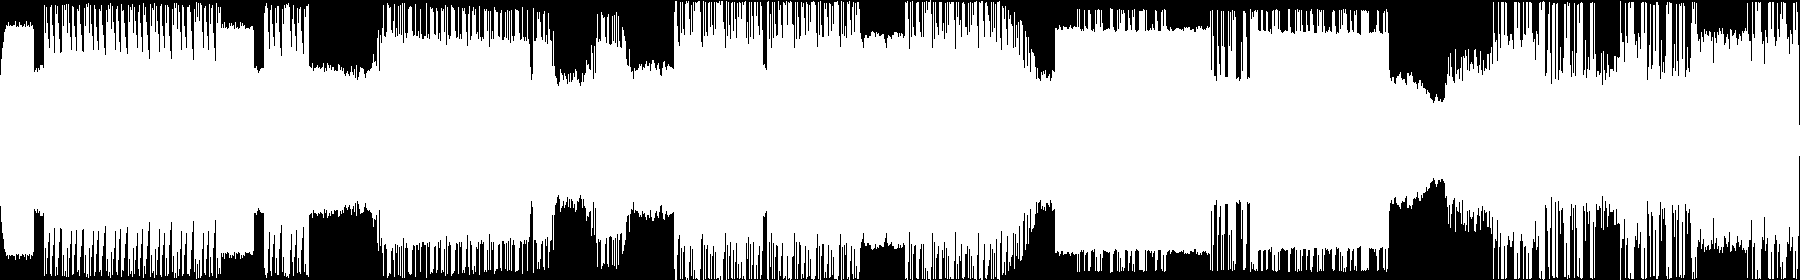 Triple 6 audio waveform